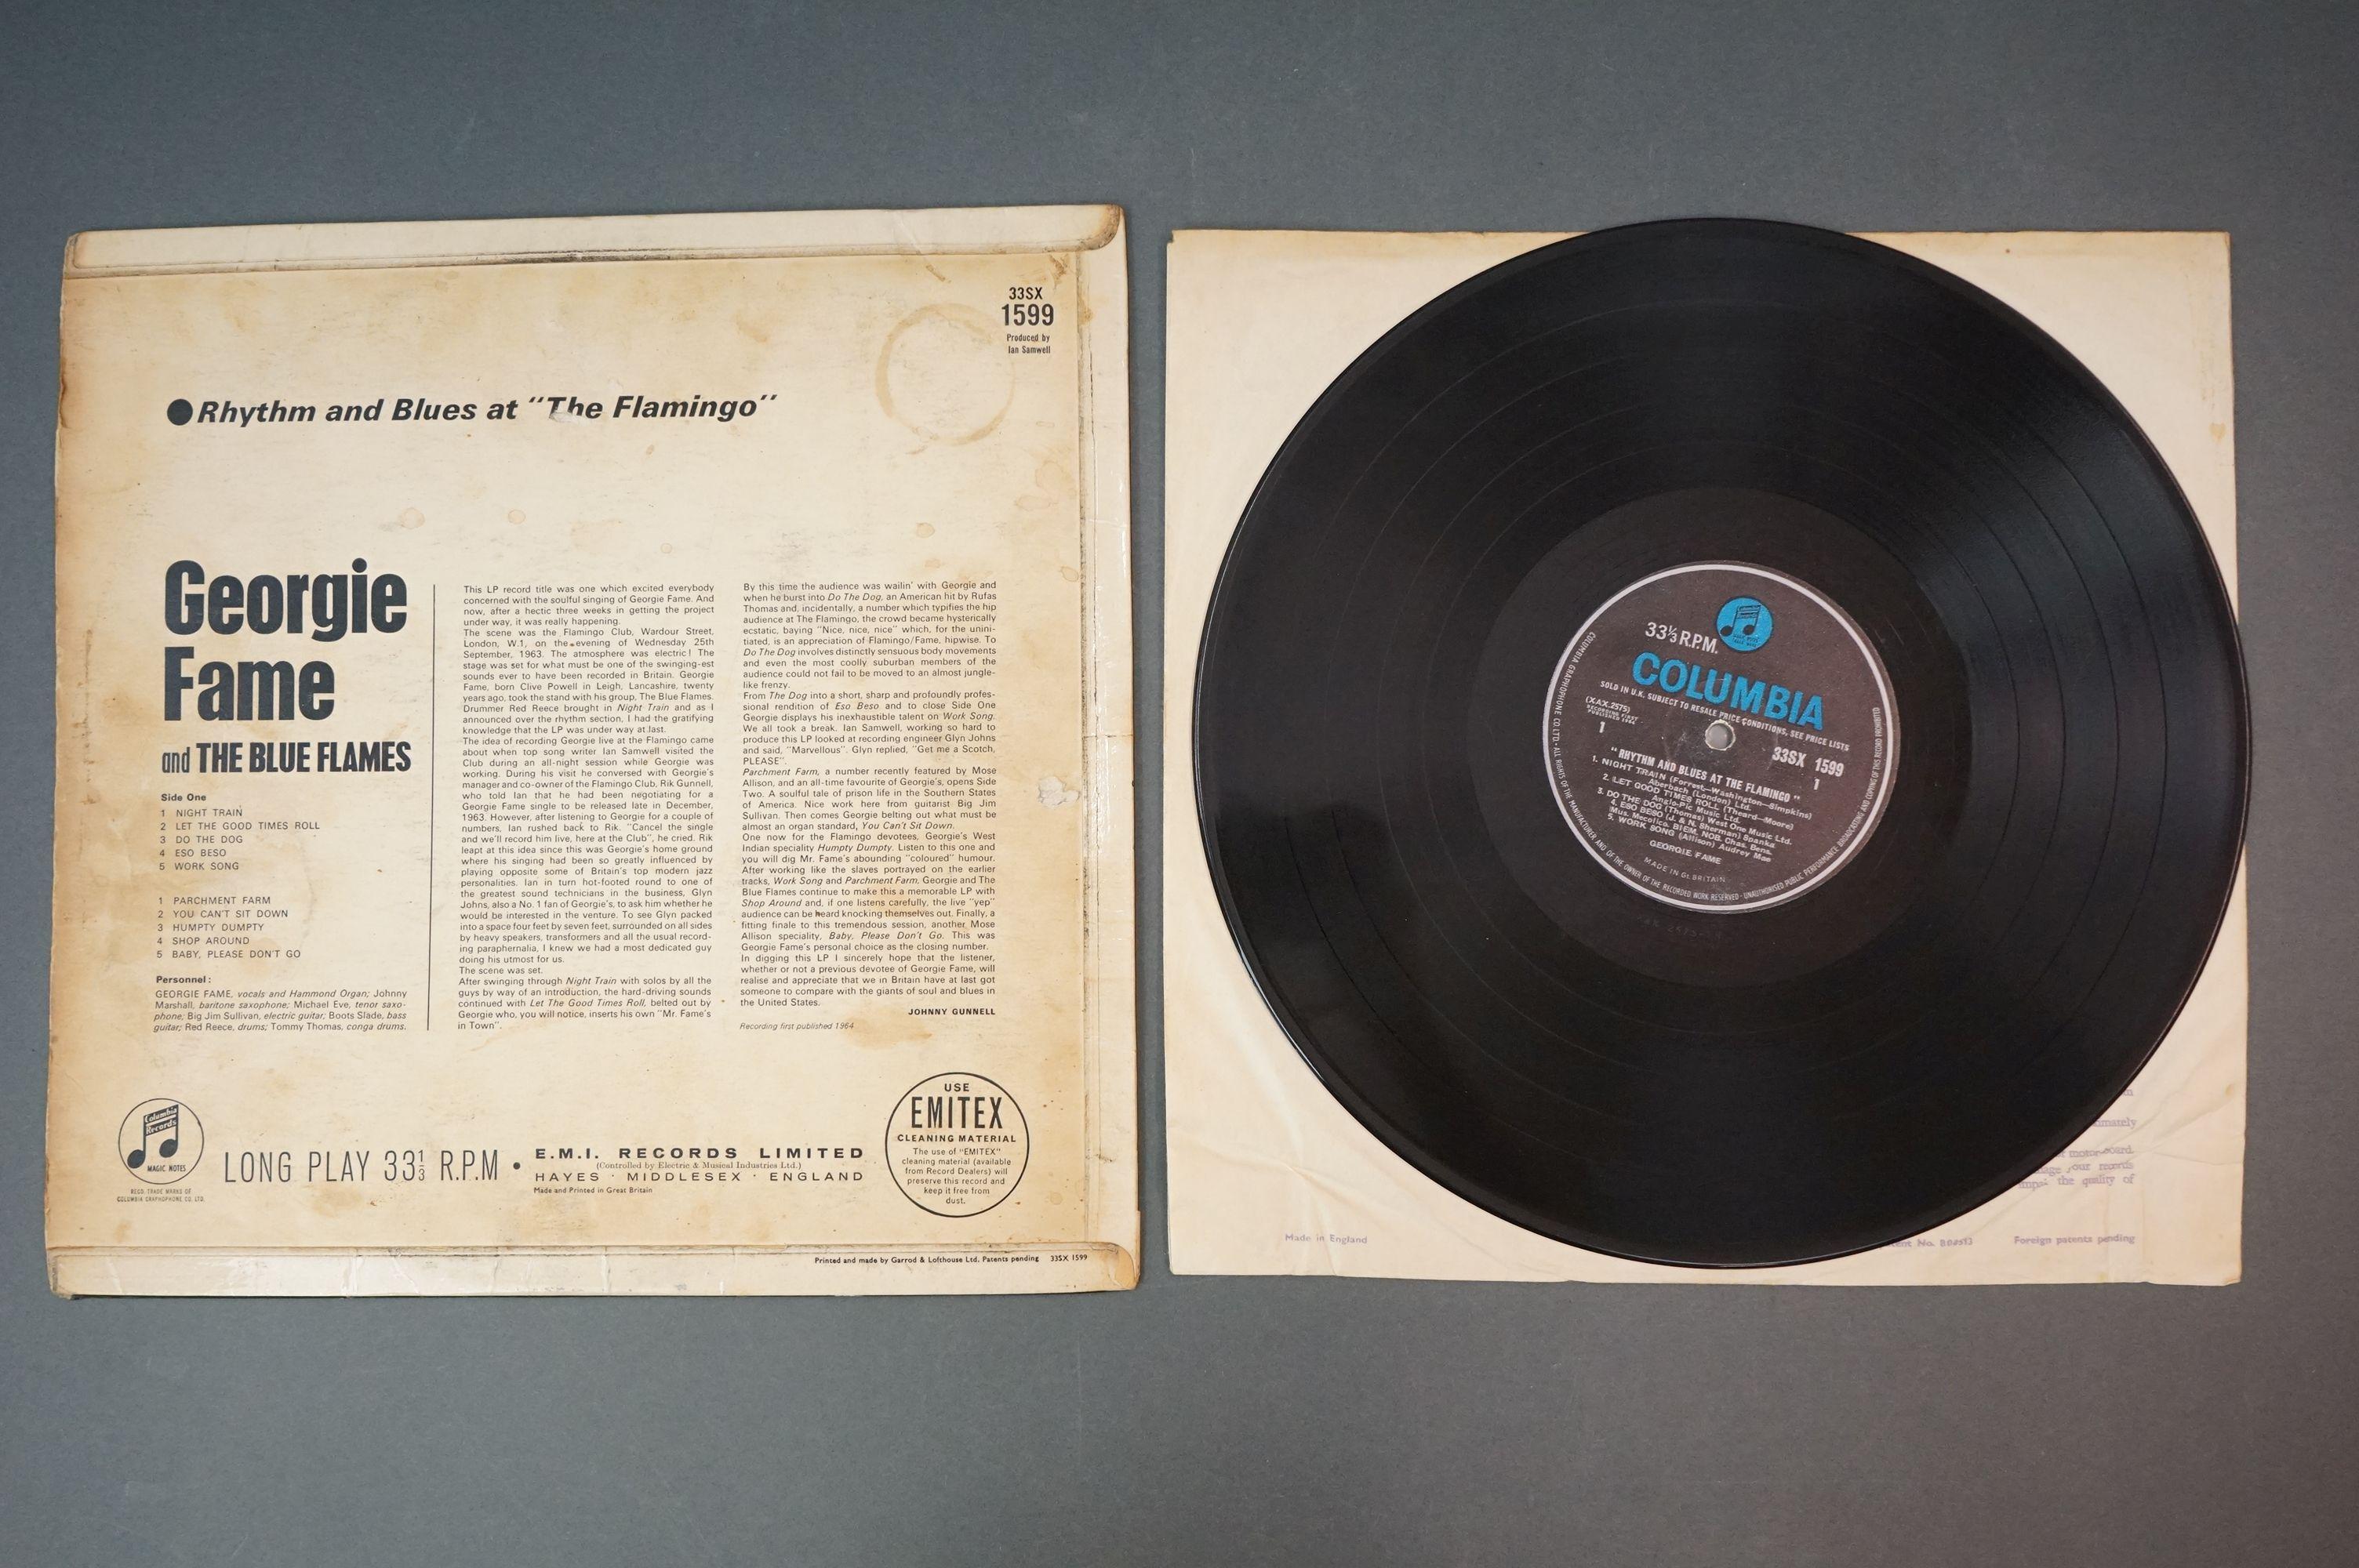 Vinyl - Georgie Fame Rhythm And Blues At The Flamingo (Columbia 33 SX 1599). Sleeve & Vinyl VG- - Image 3 of 4